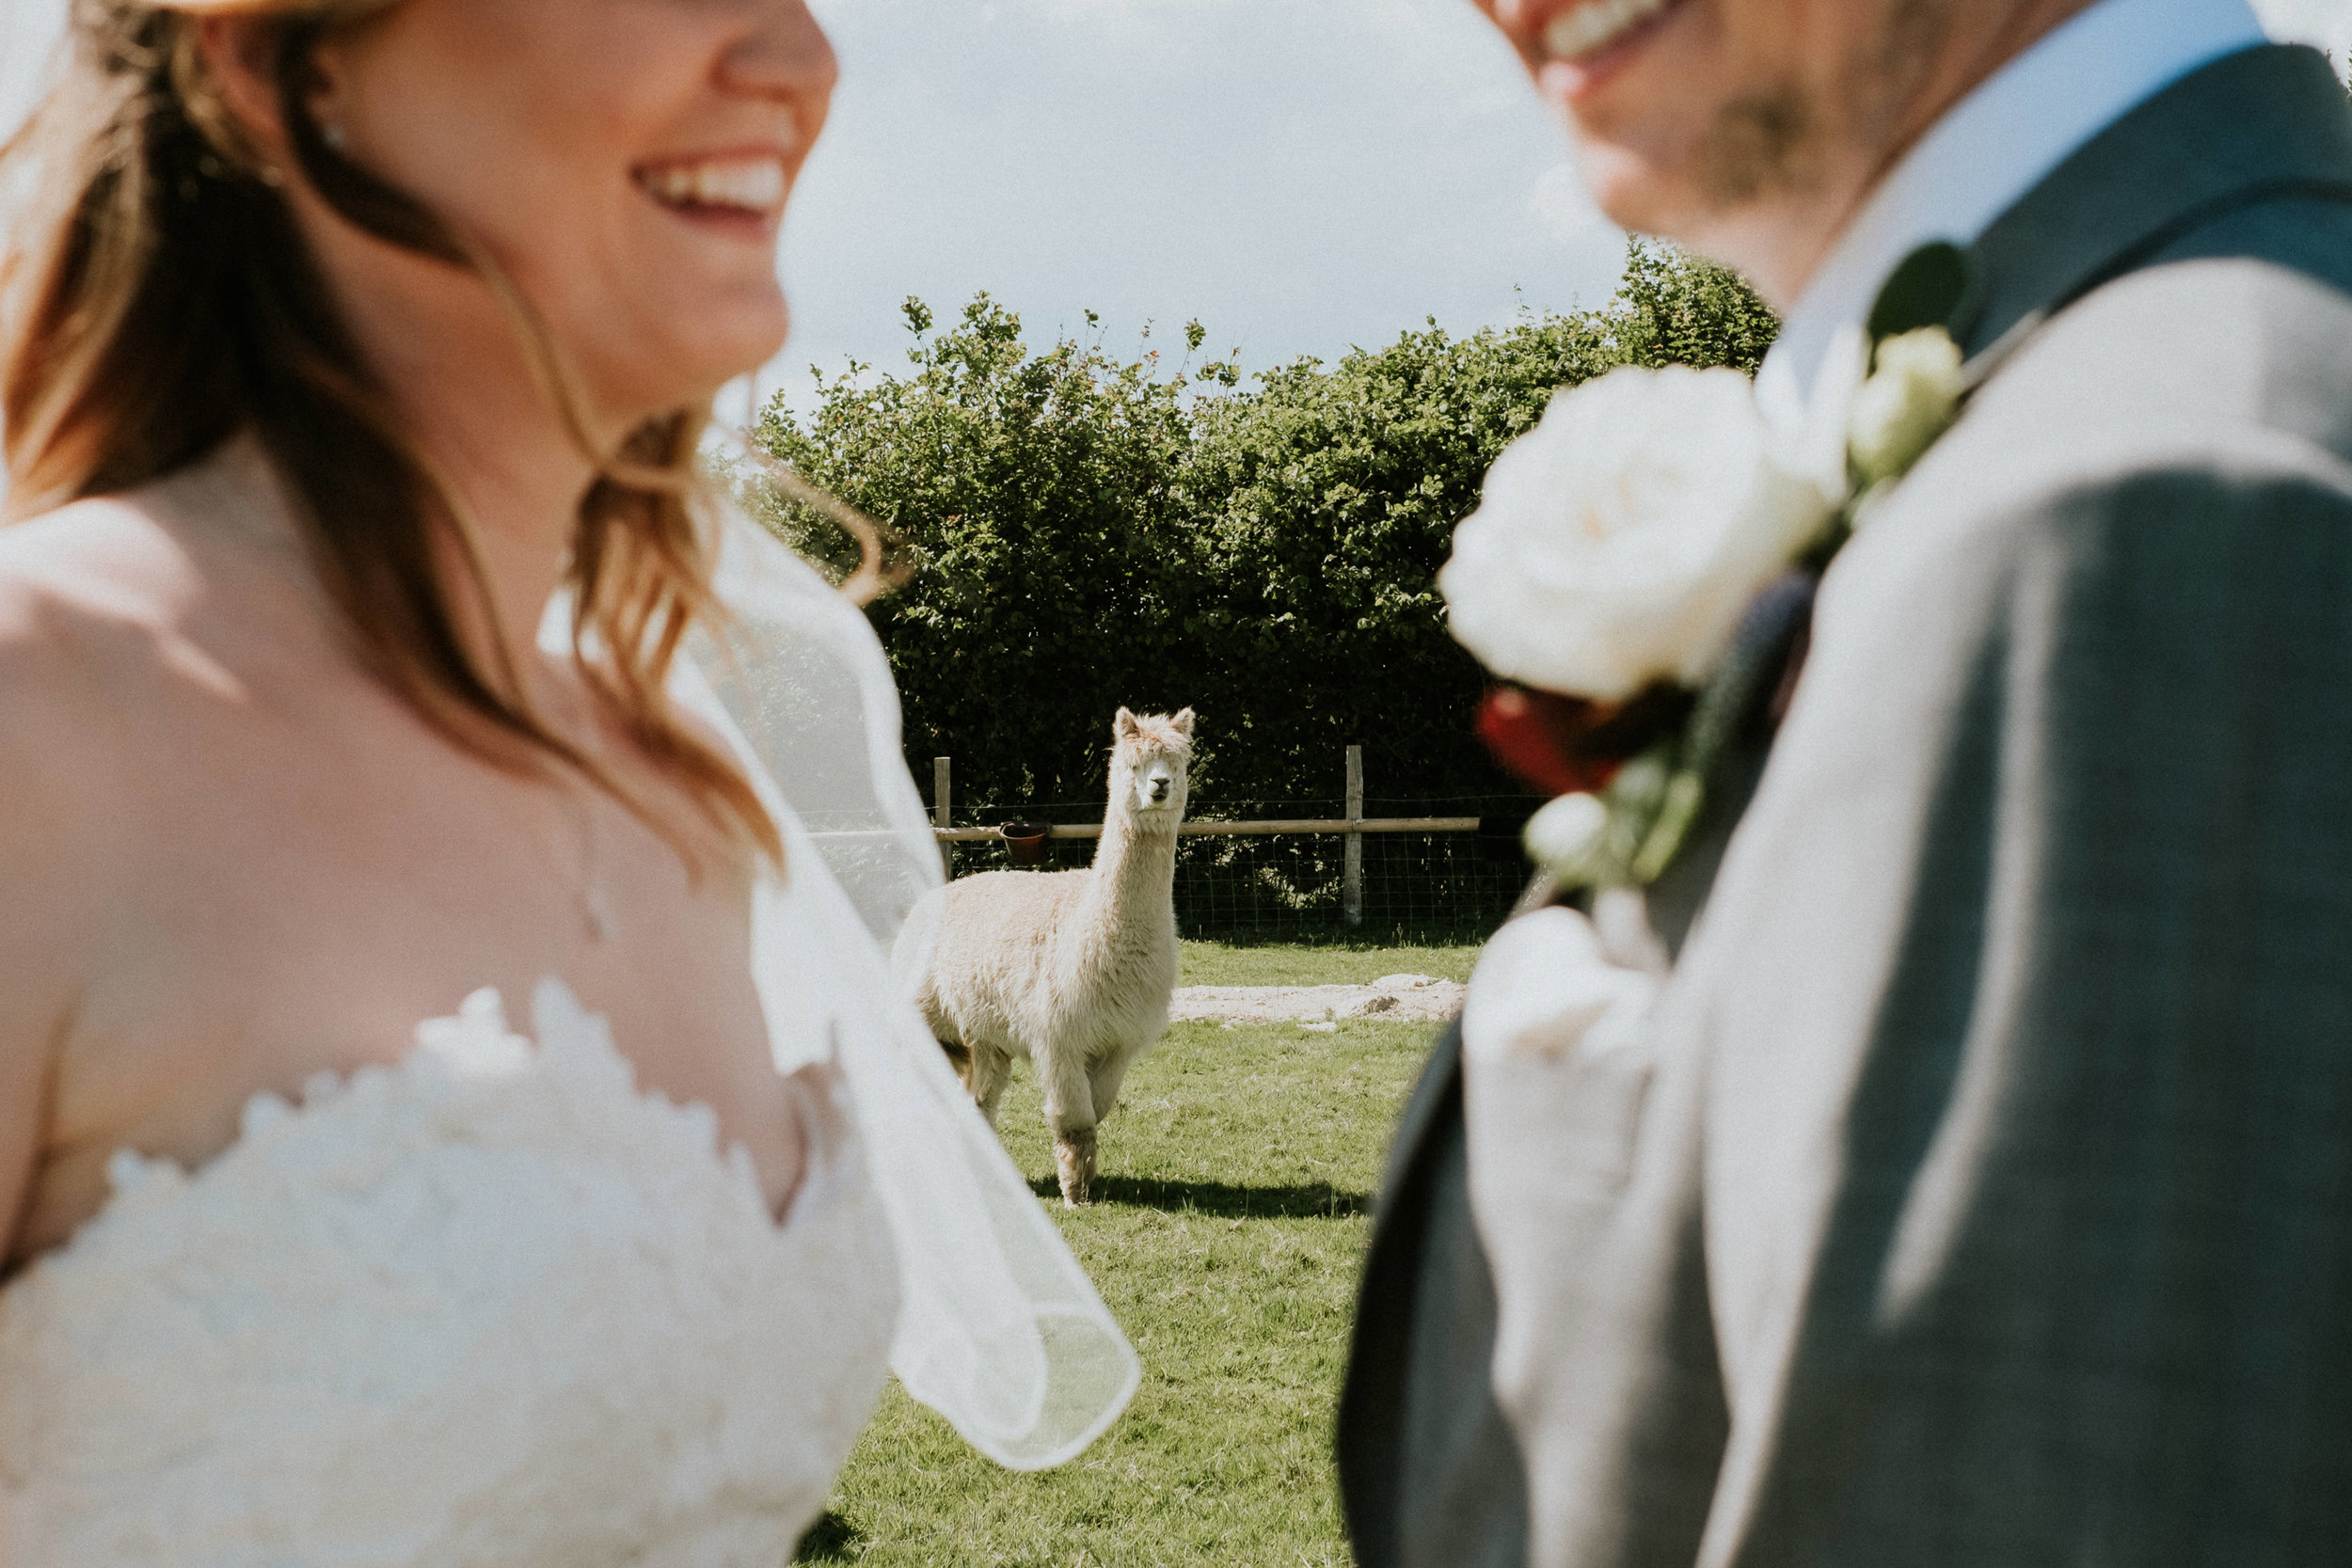 65 Sussex alternative wedding photography joanna nicole 1.jpg